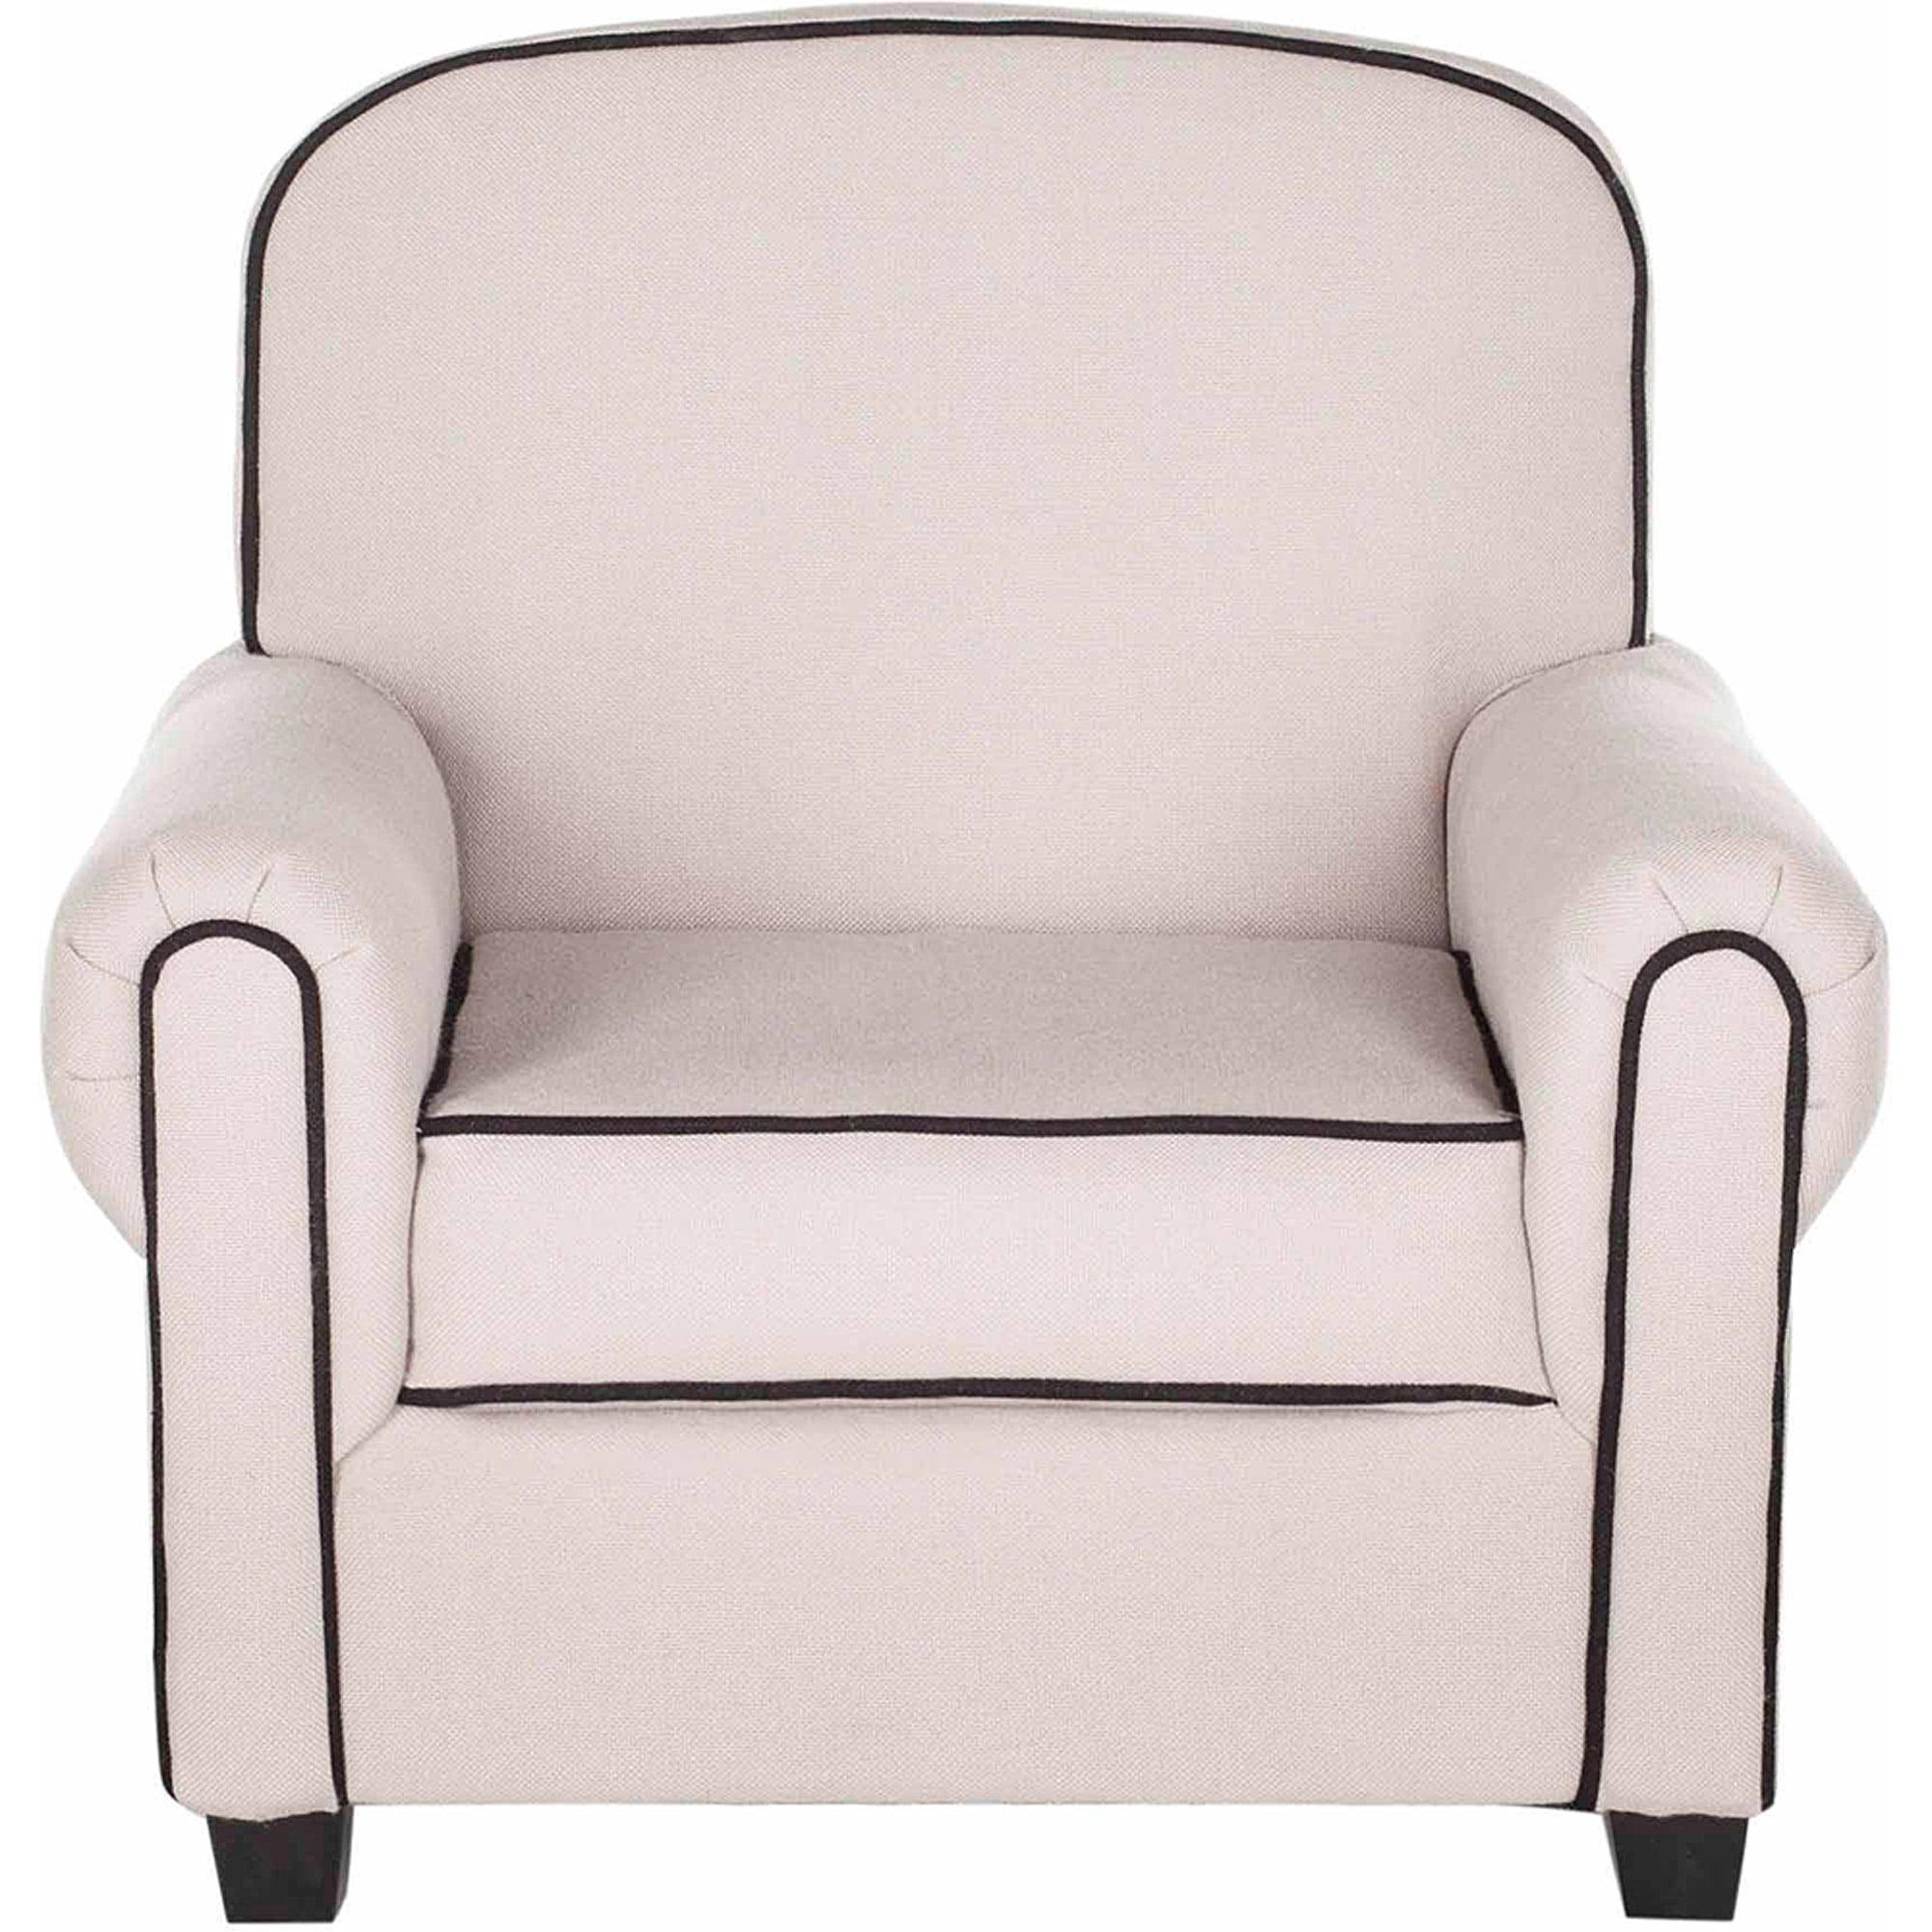 Safavieh Kids Tiny Tycoon Club Chair, Multiple Colors